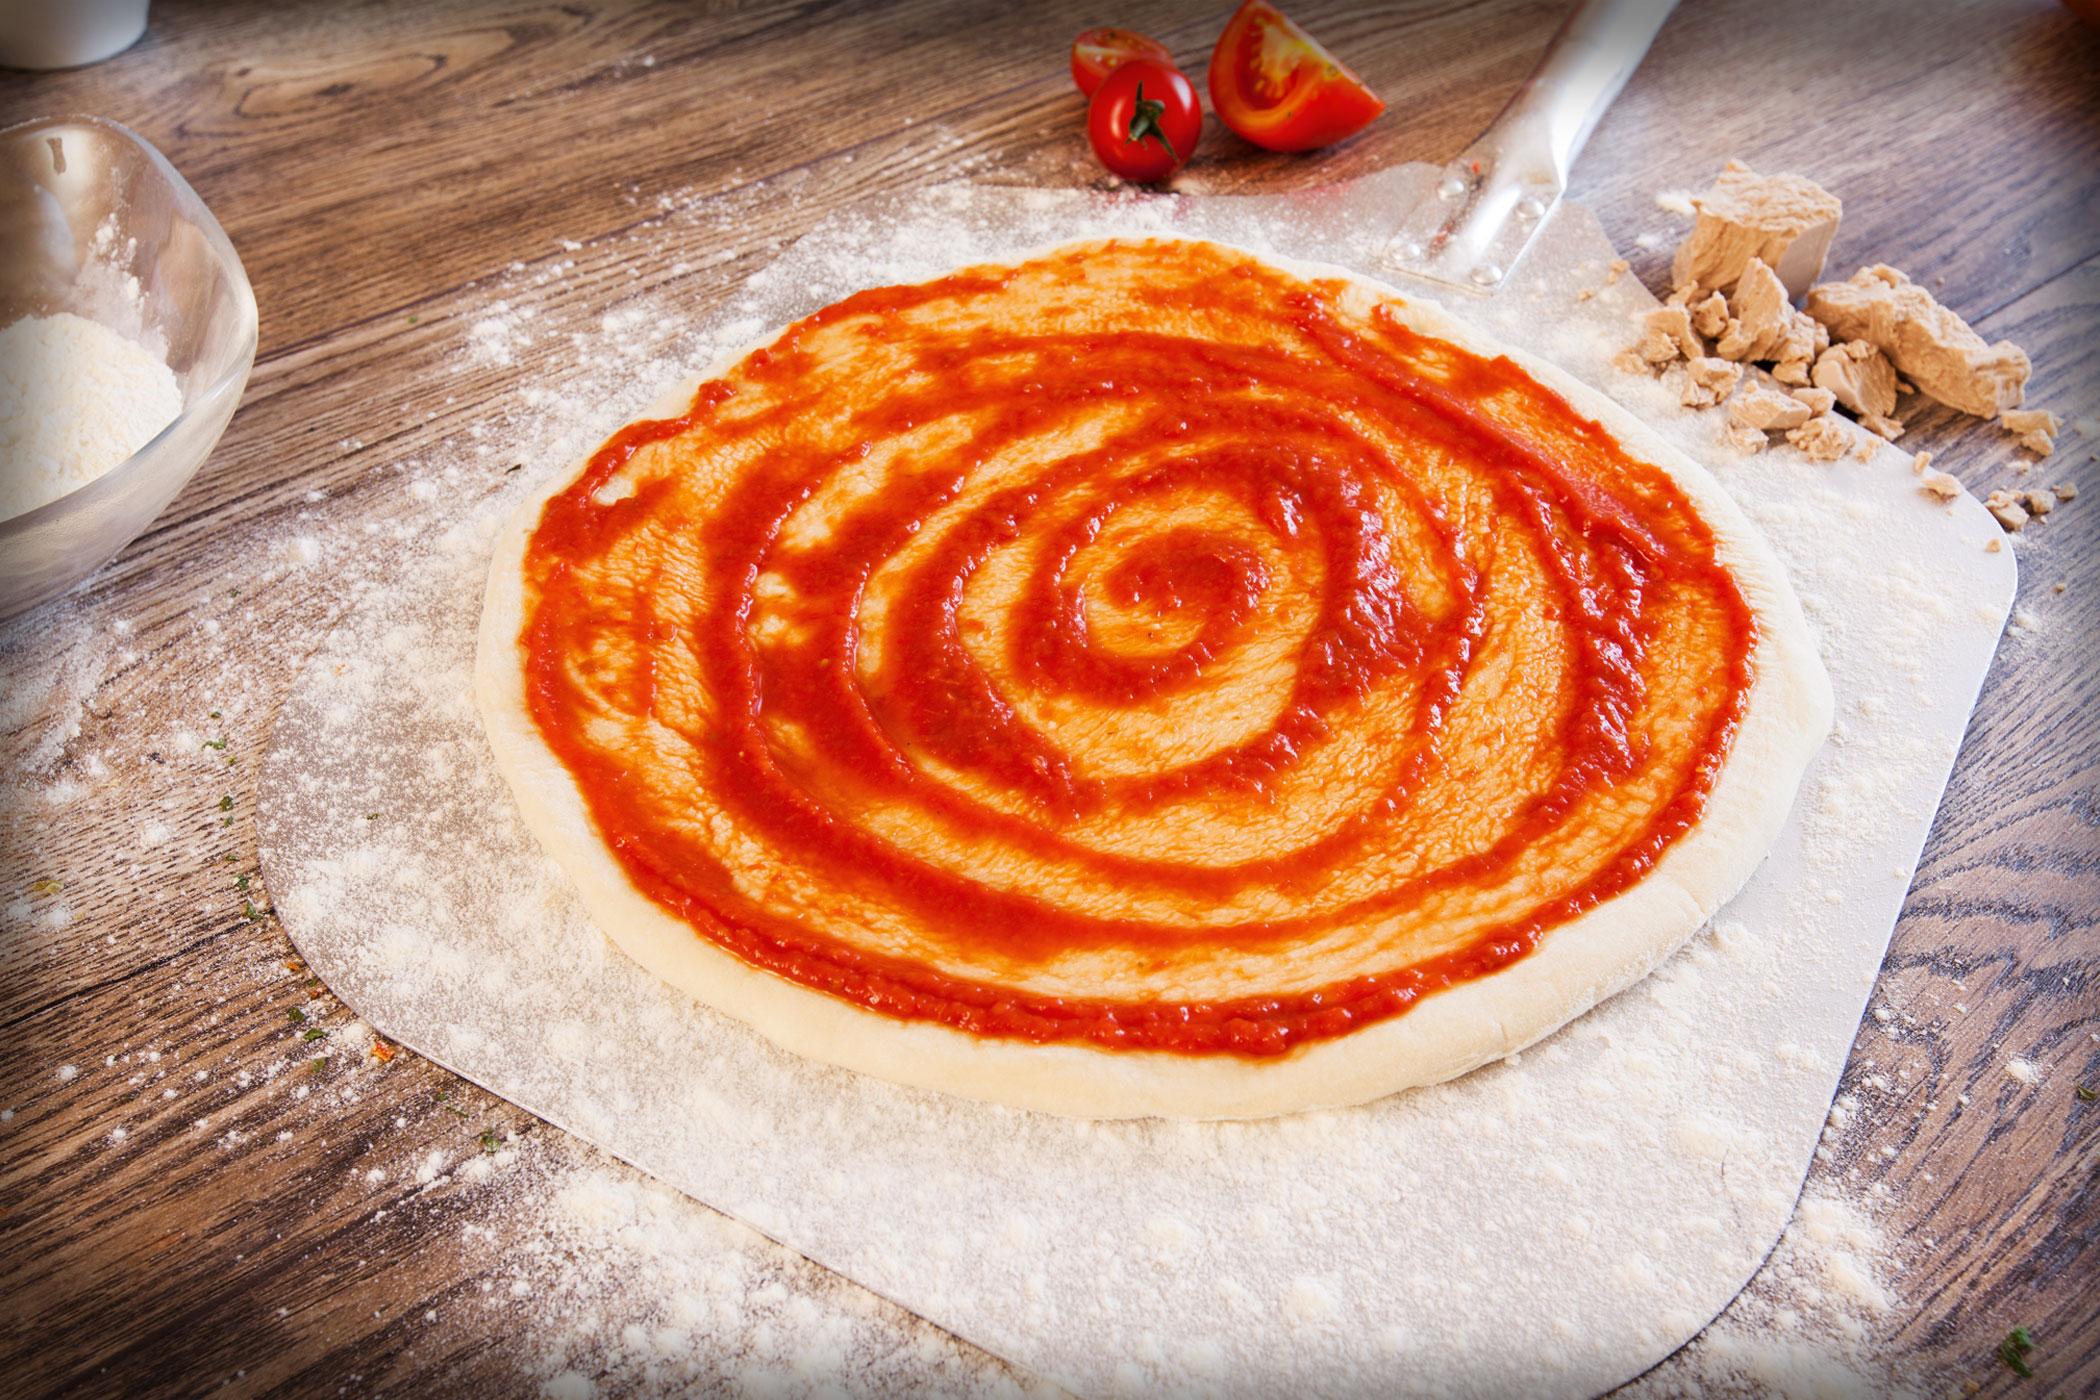 Original Franzesco Pizzaboden mit Tomatenpulpe